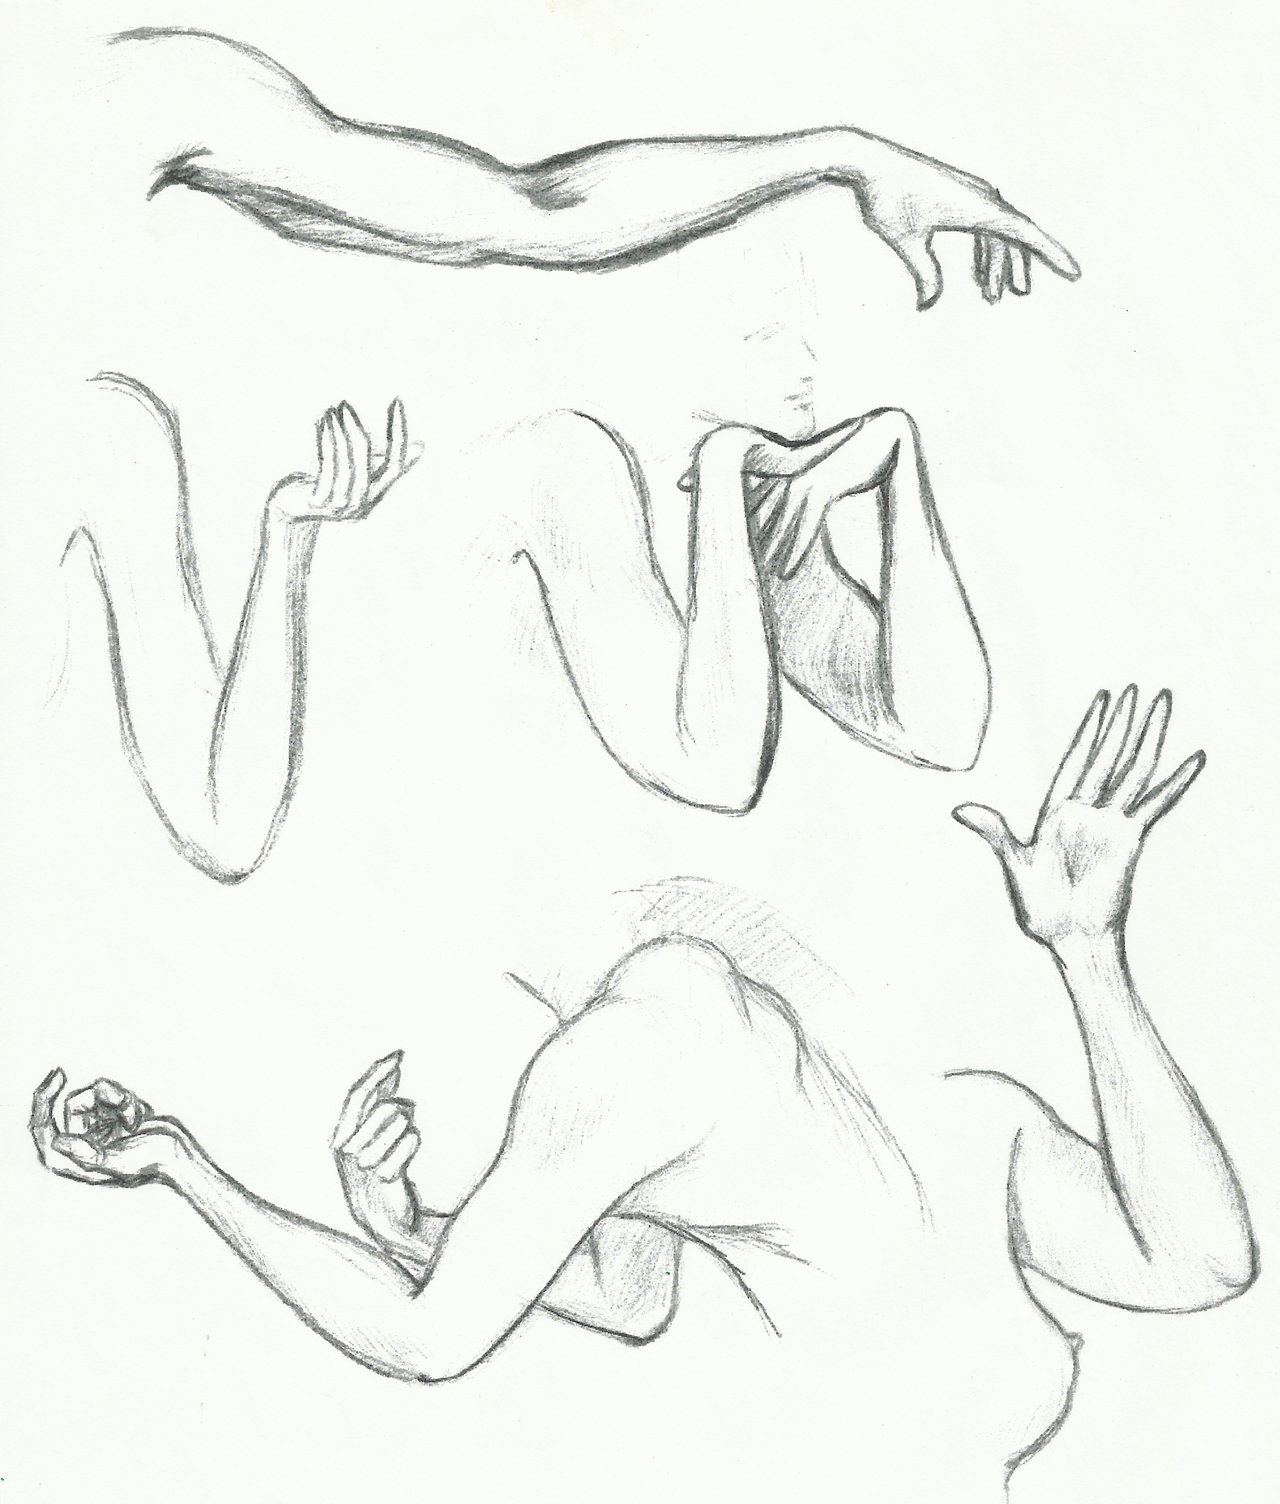 1280x1504 Daily Sketch